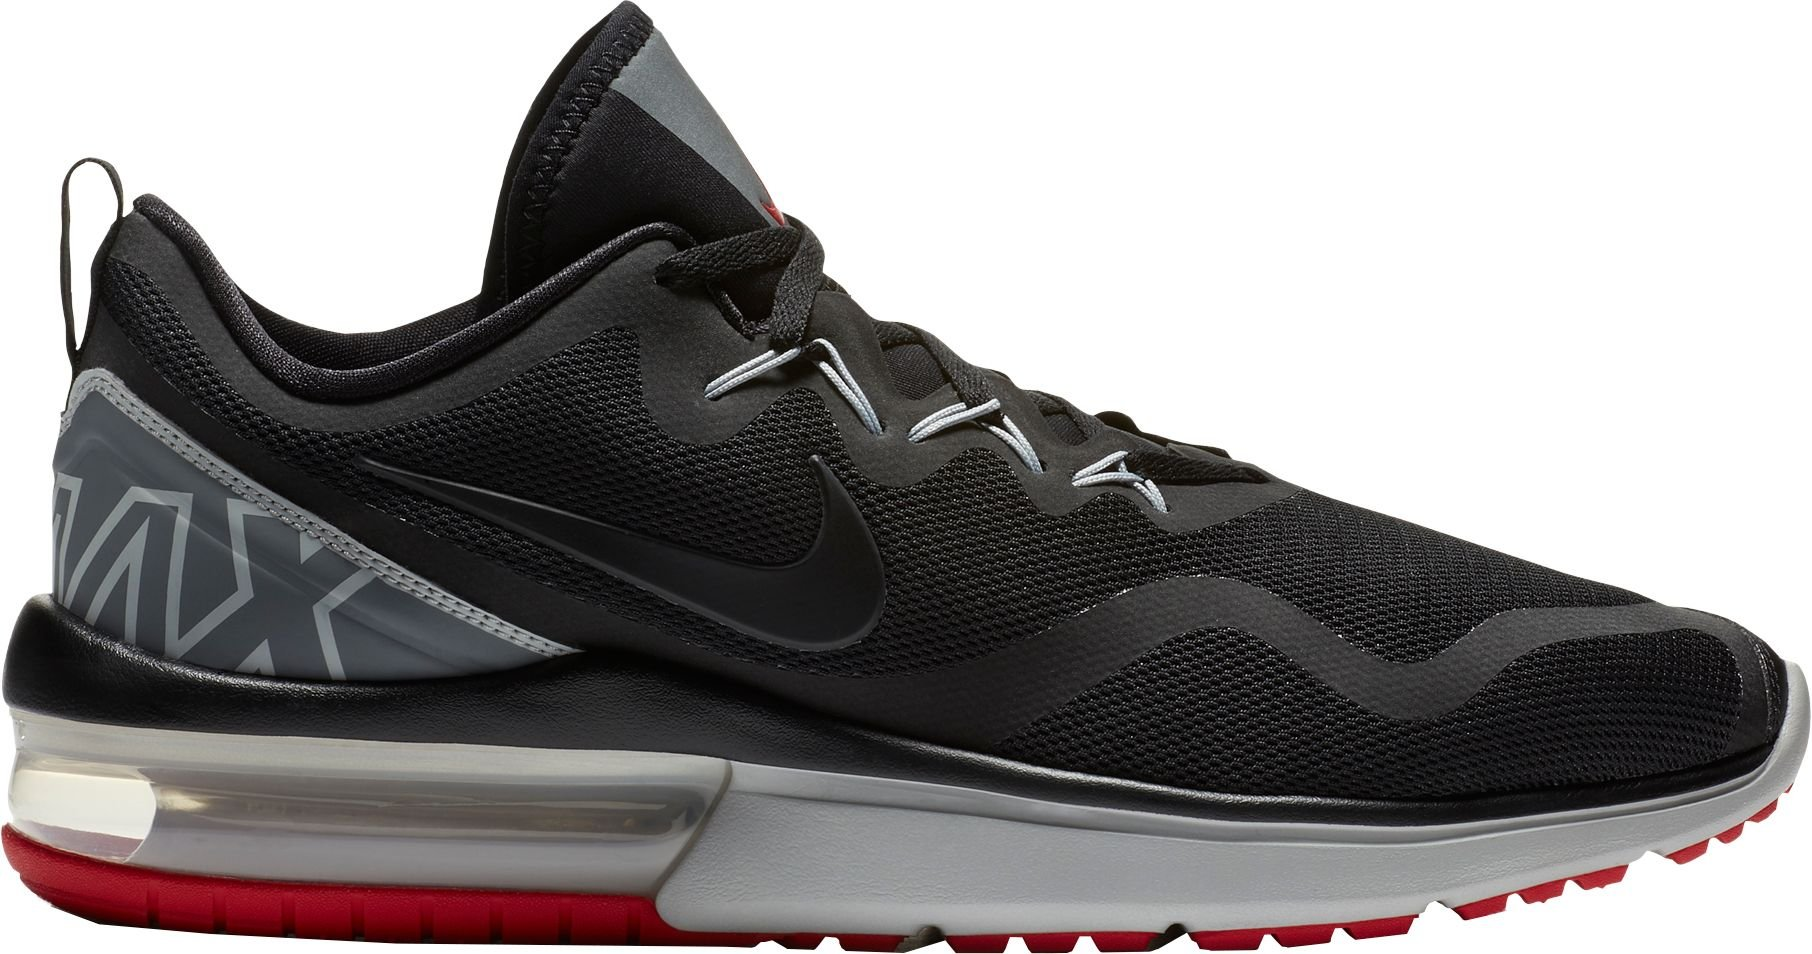 c0fb075759fc14 Galleon - Nike Mens AIR MAX Fury Black Grey RED Size 11